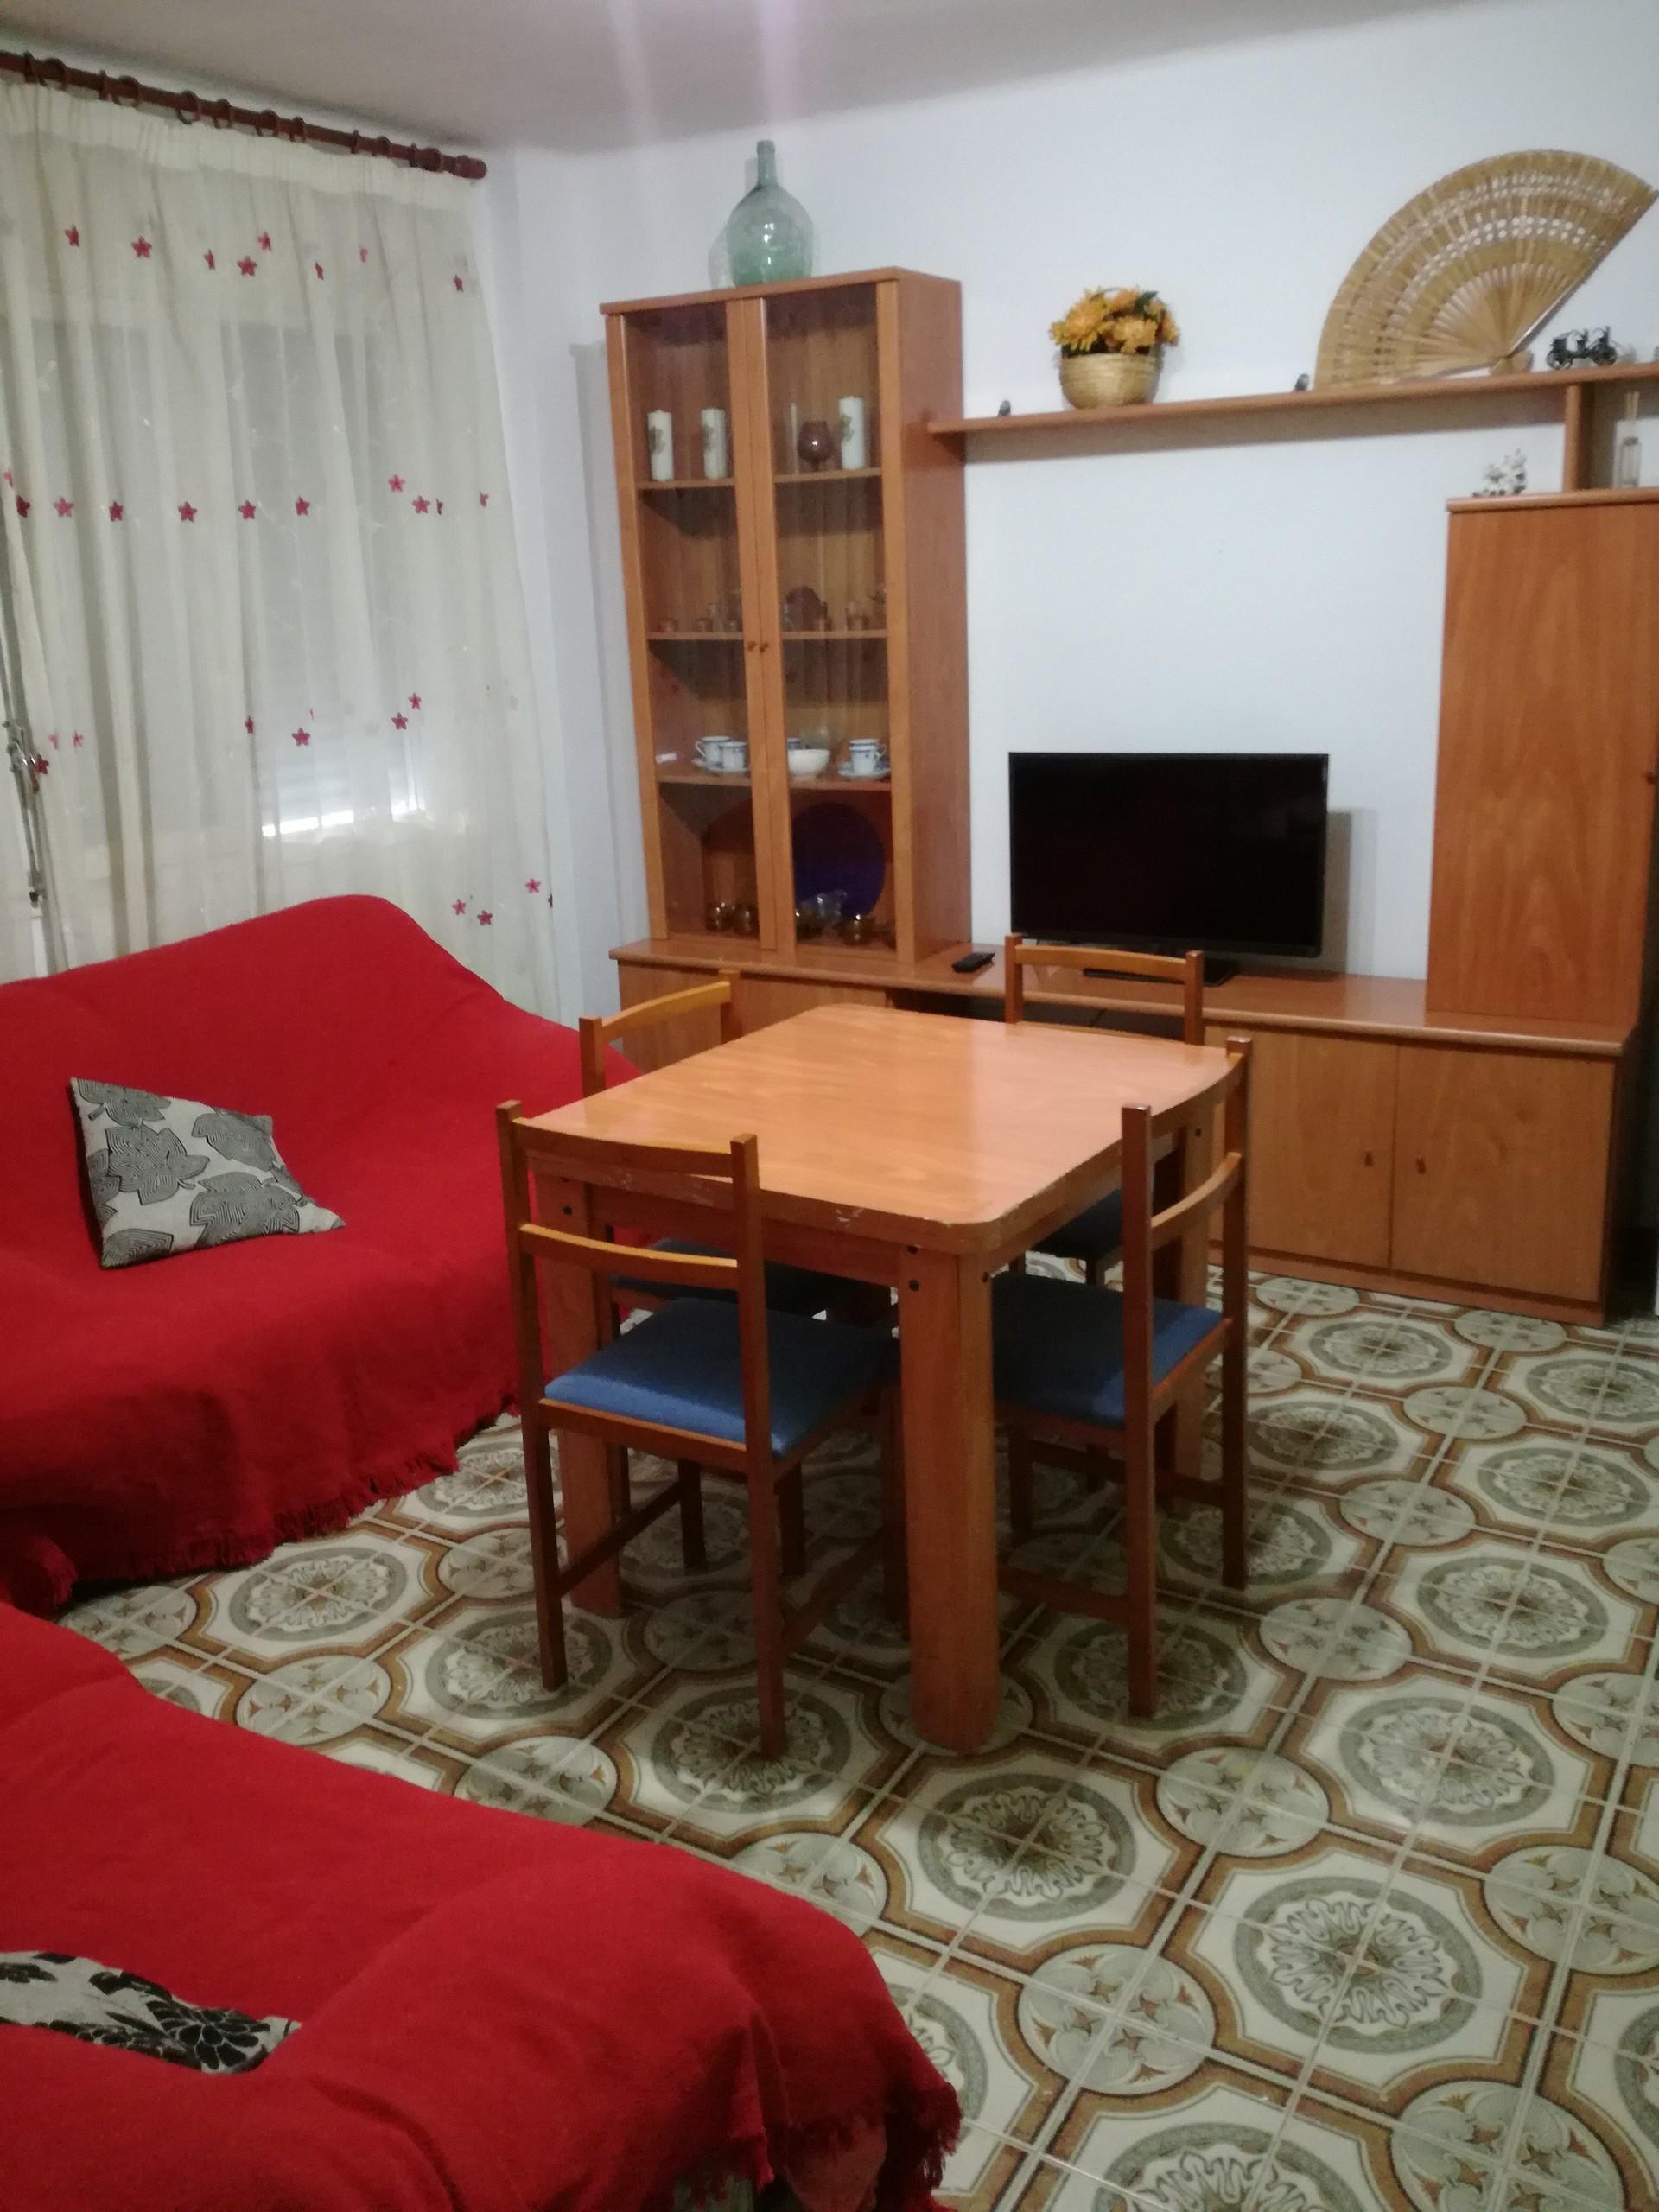 Alquiler de habitaci n en cerdanyola del vall s barcelona alquiler habitaciones barber del - Muebles barbera del valles ...